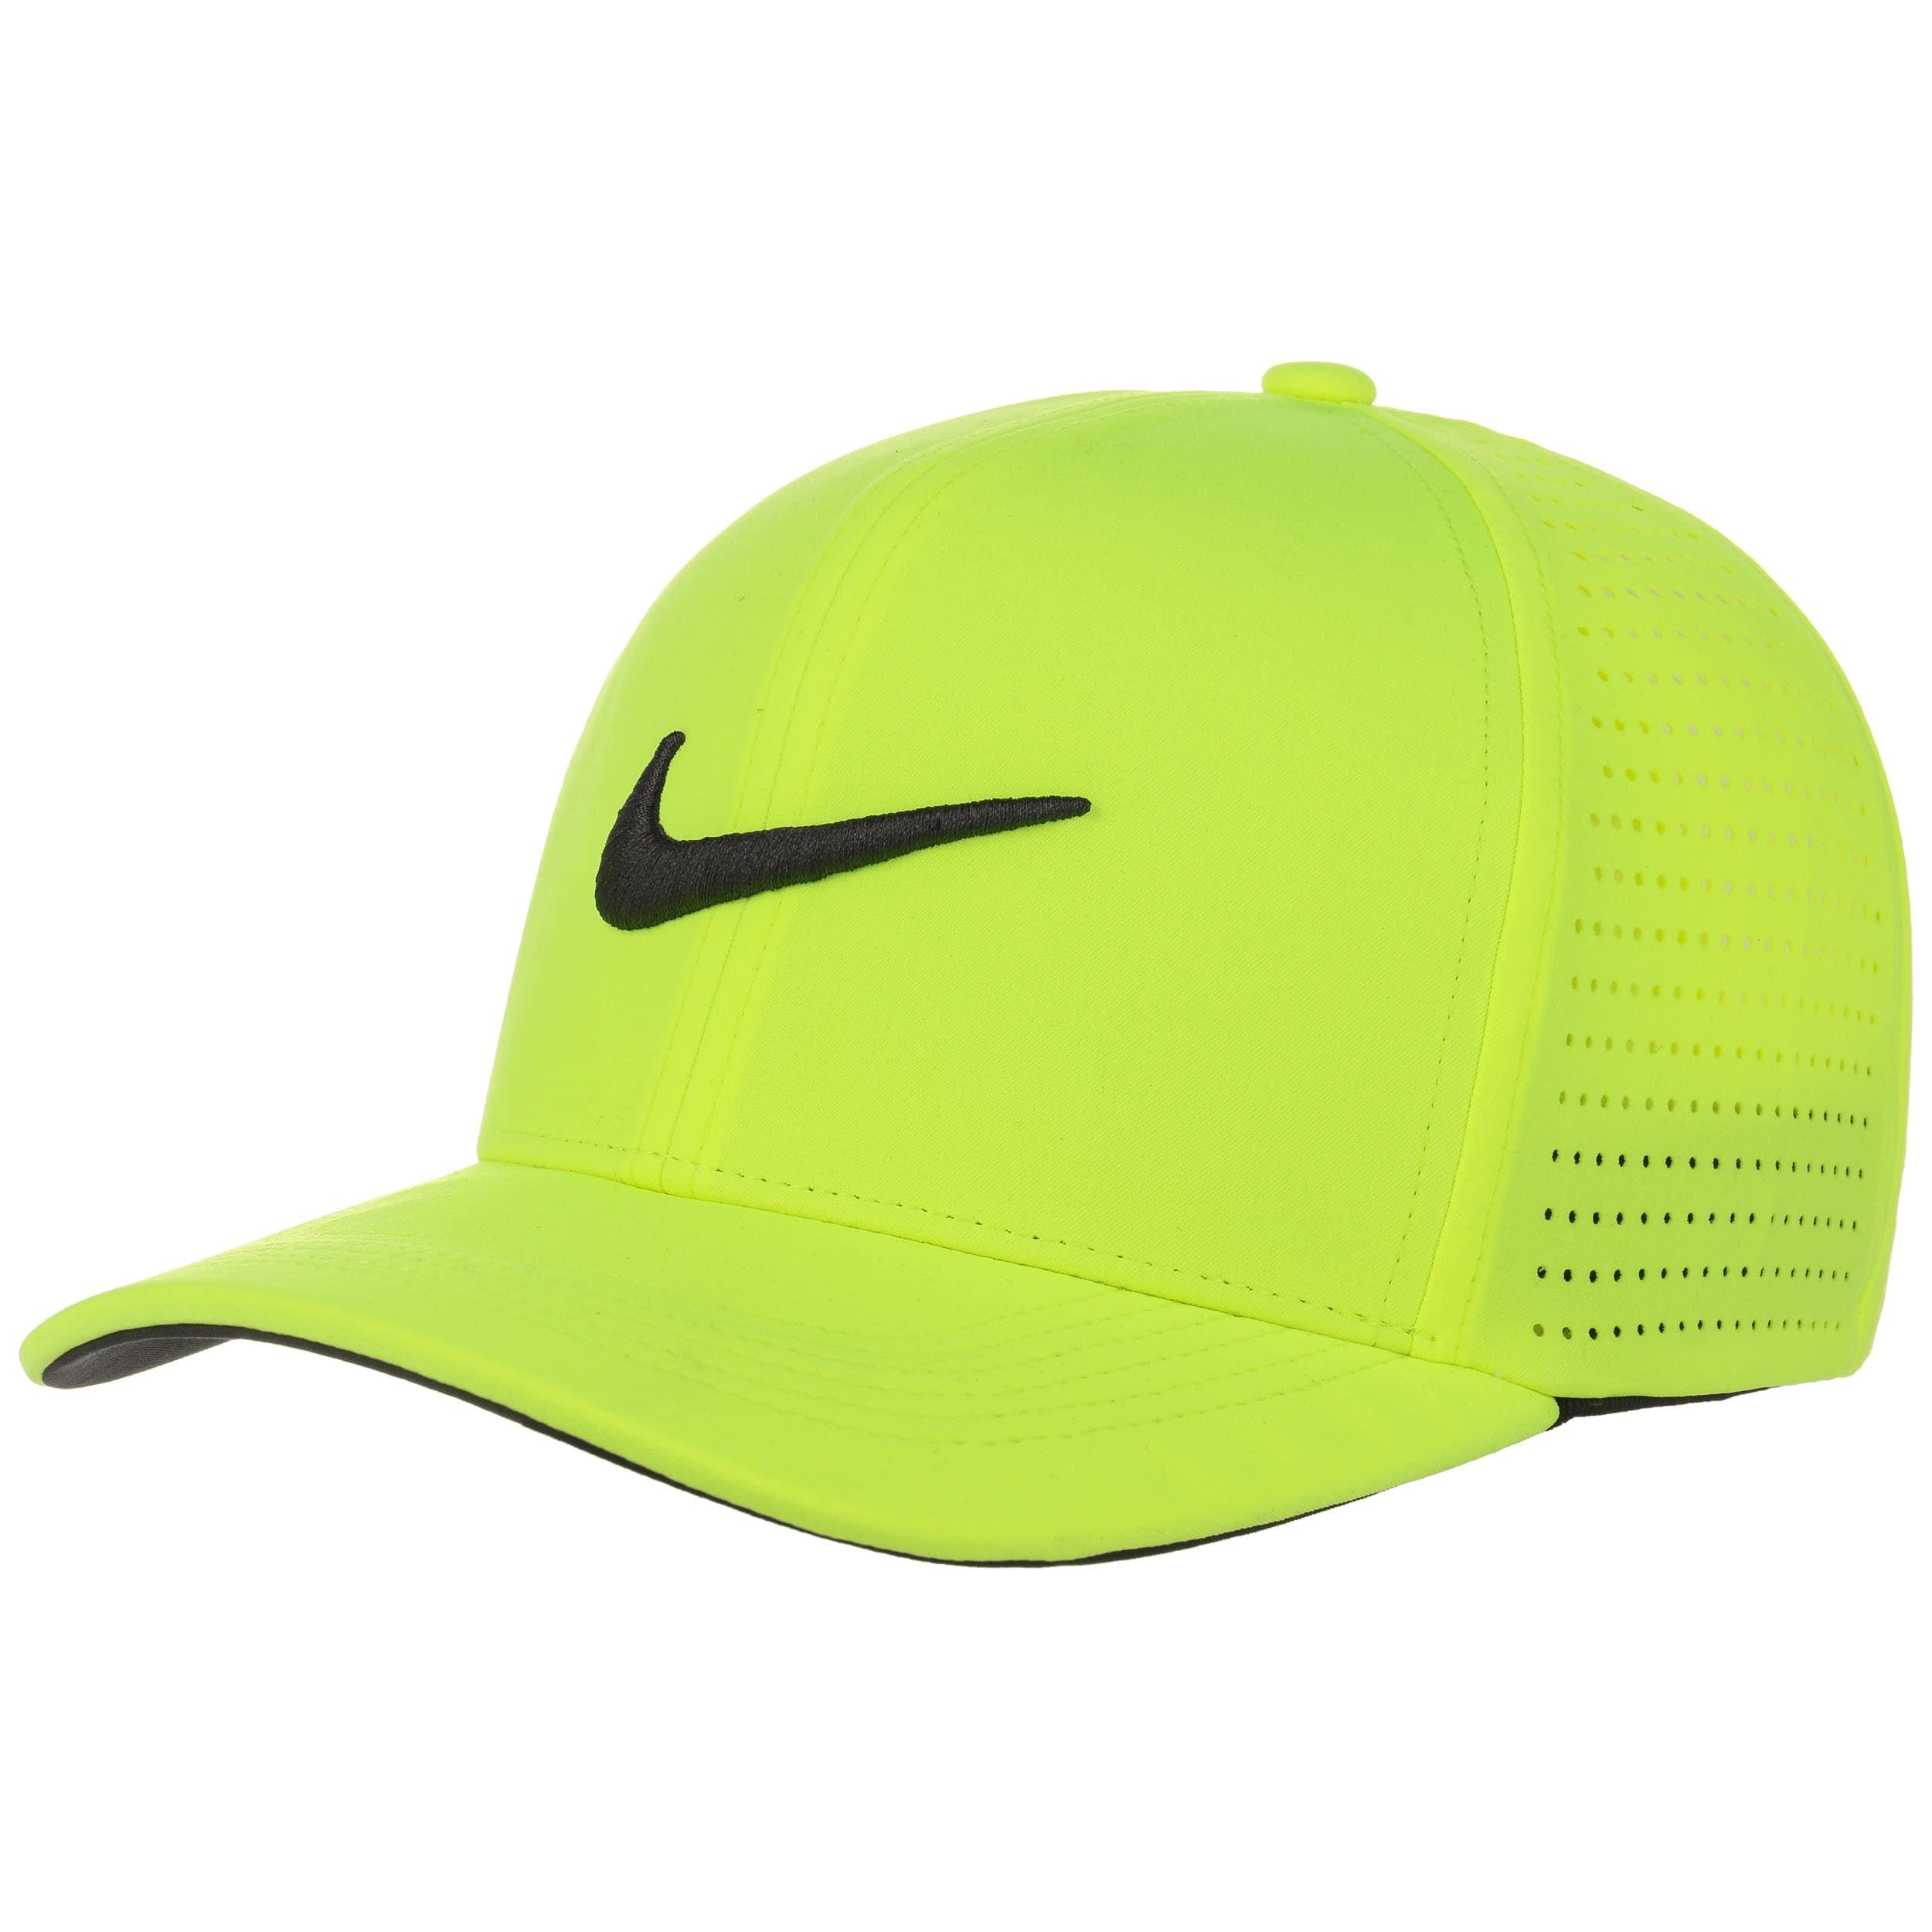 c627f060c3b ... Golf Classic 99 Baseball Cap by Nike - neon yellow 5 ...